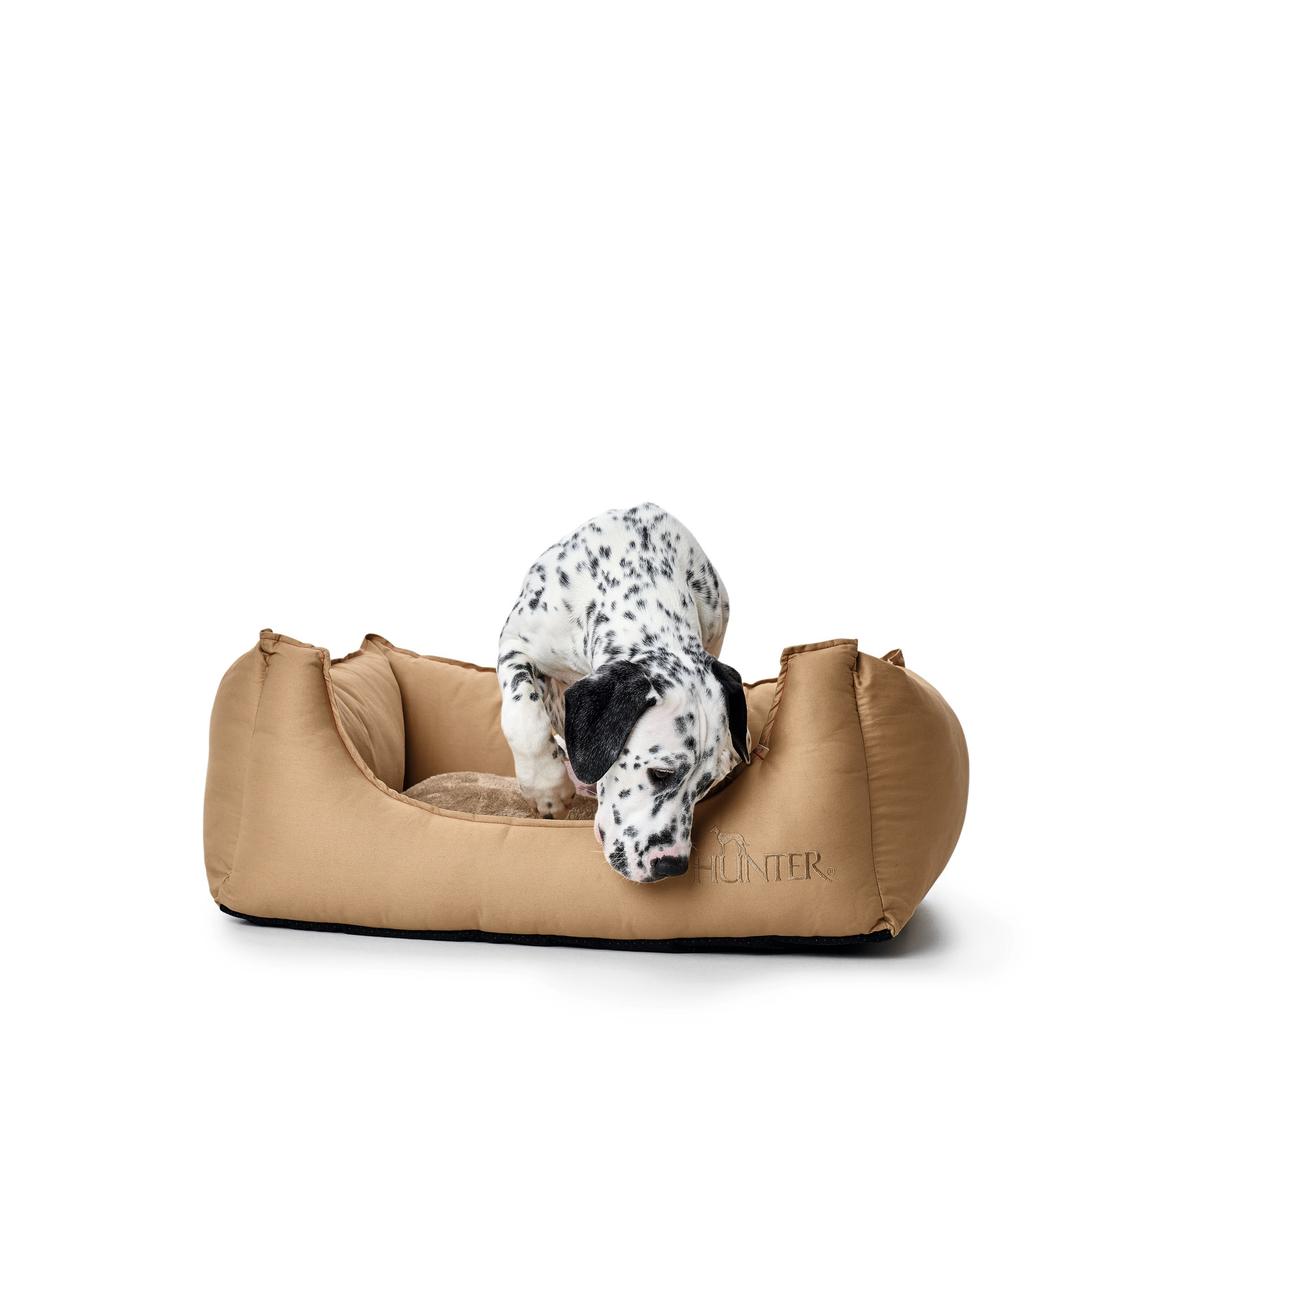 Hunter Hundesofa Sanremo 65105, Bild 11